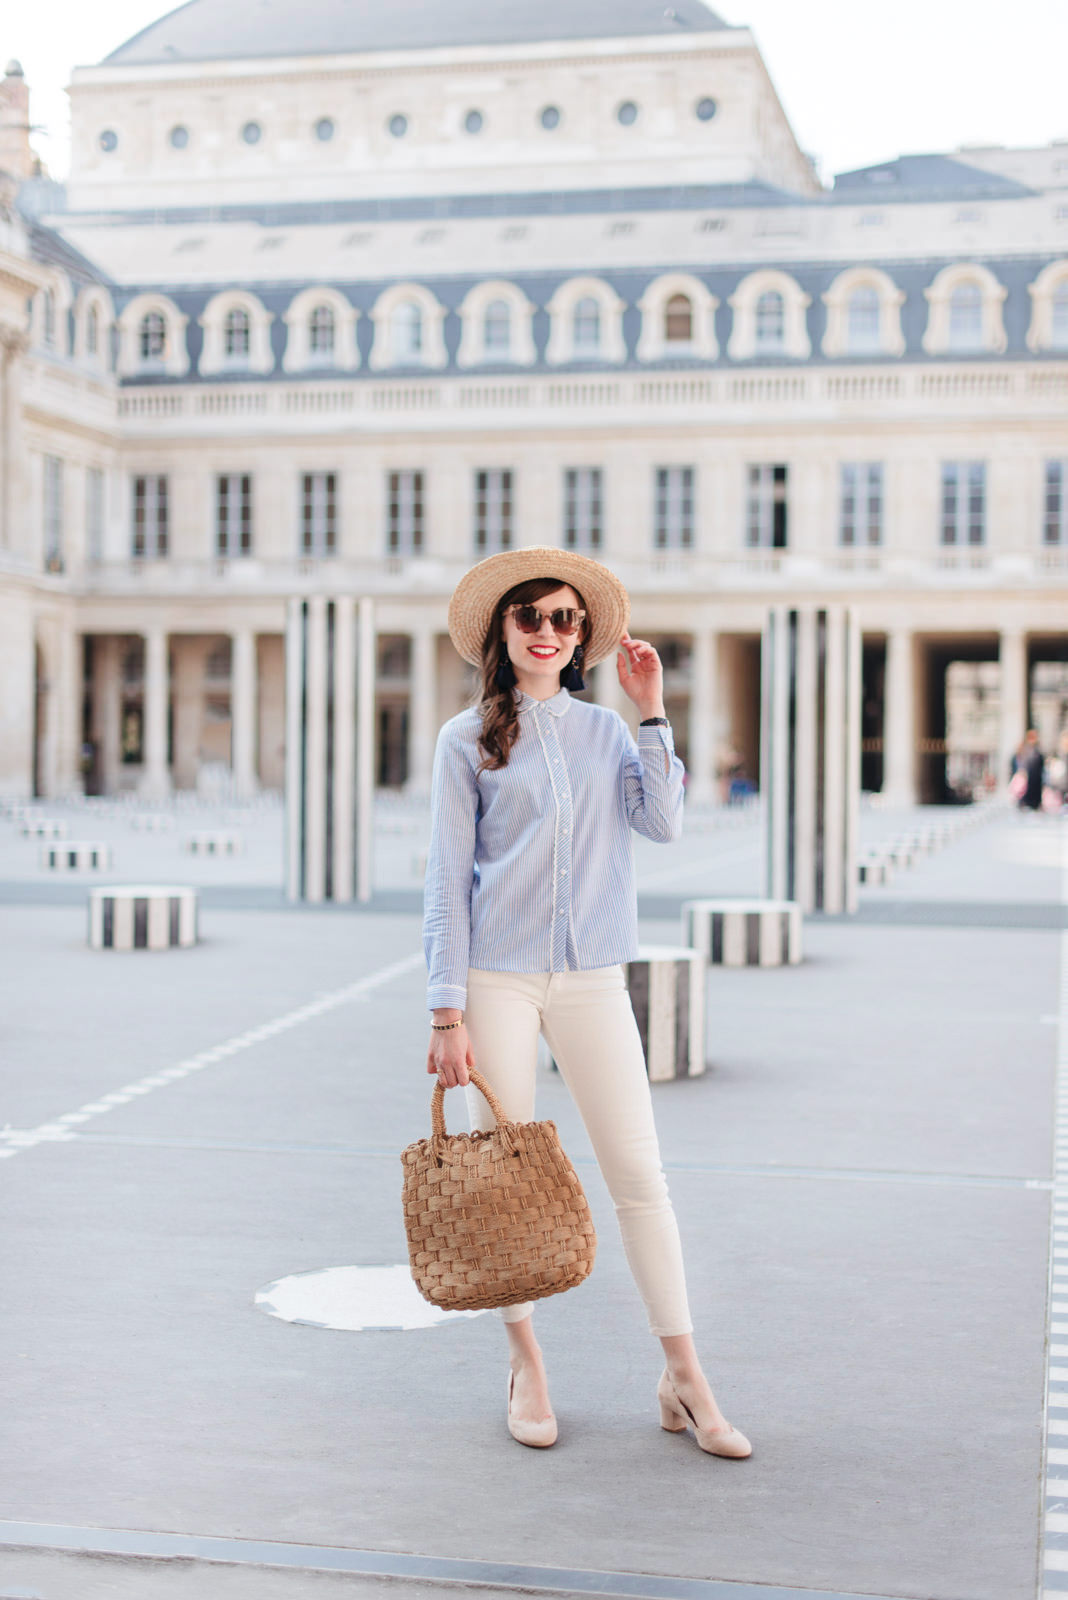 Blog-Mode-And-The-City-Looks-Printemps-Palais-Royal-2 copie